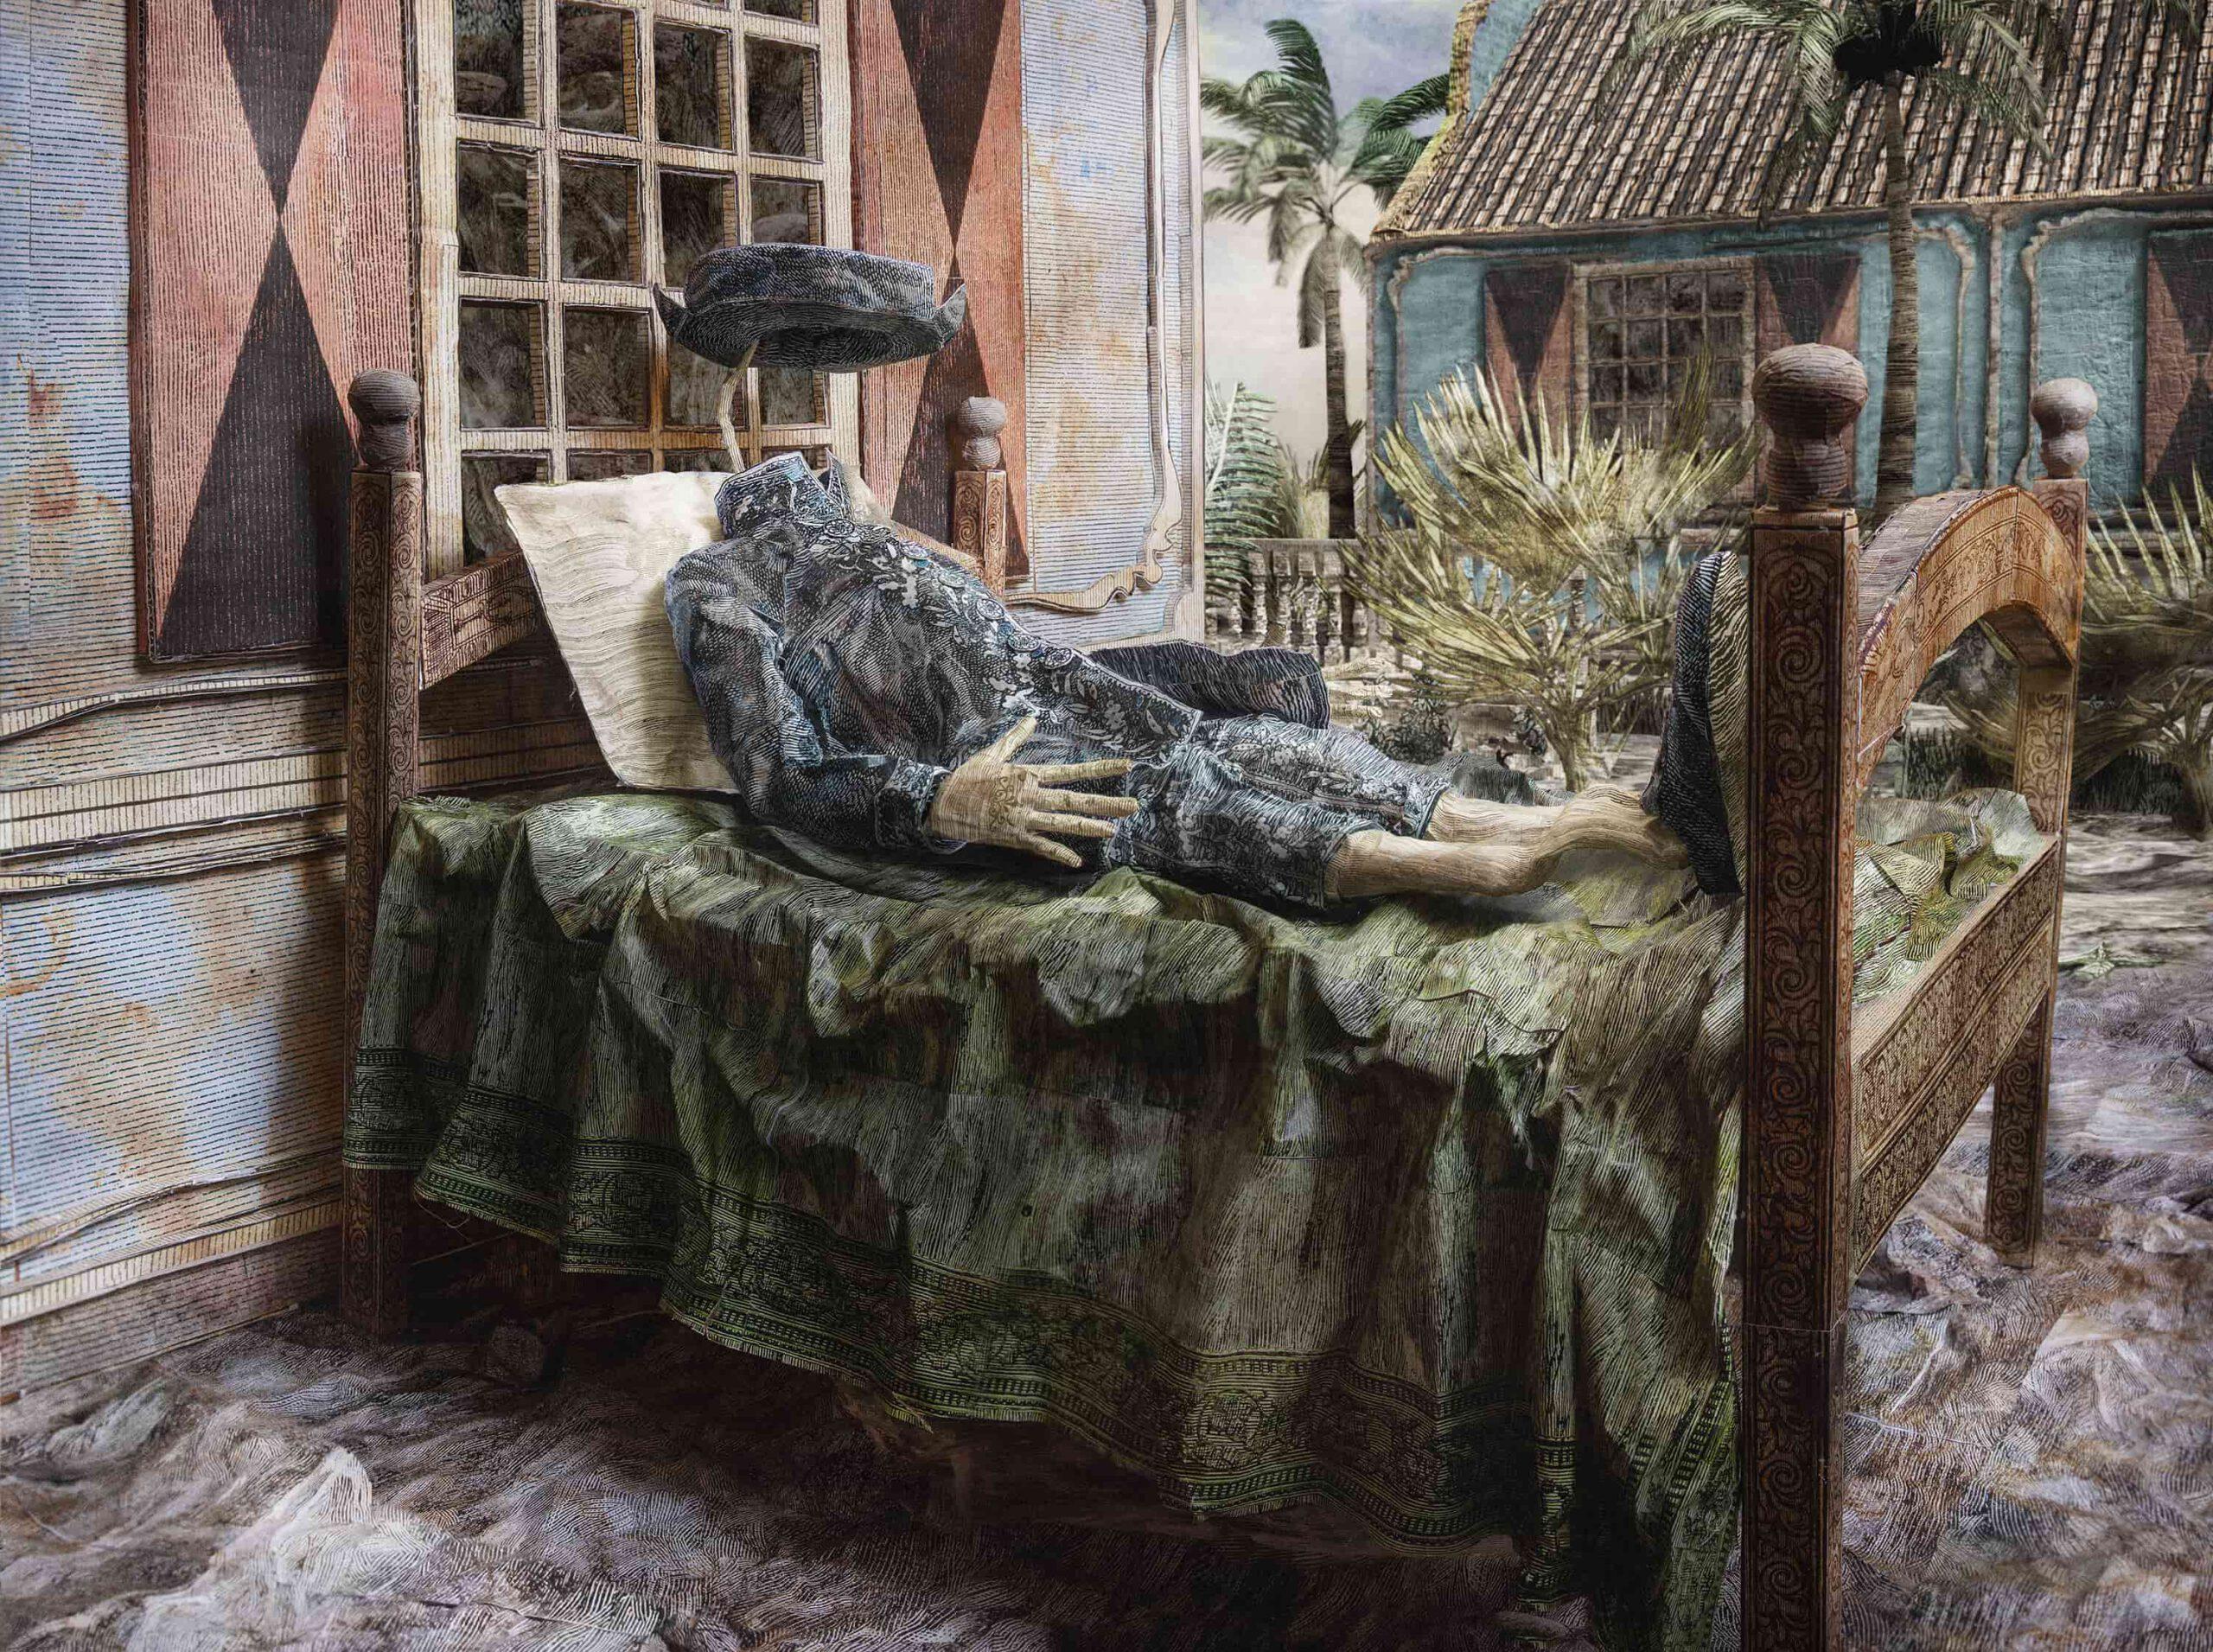 *** Capsule Presentation: Jasper de Beijer, The Admiral's Headache [on the history of slavery]